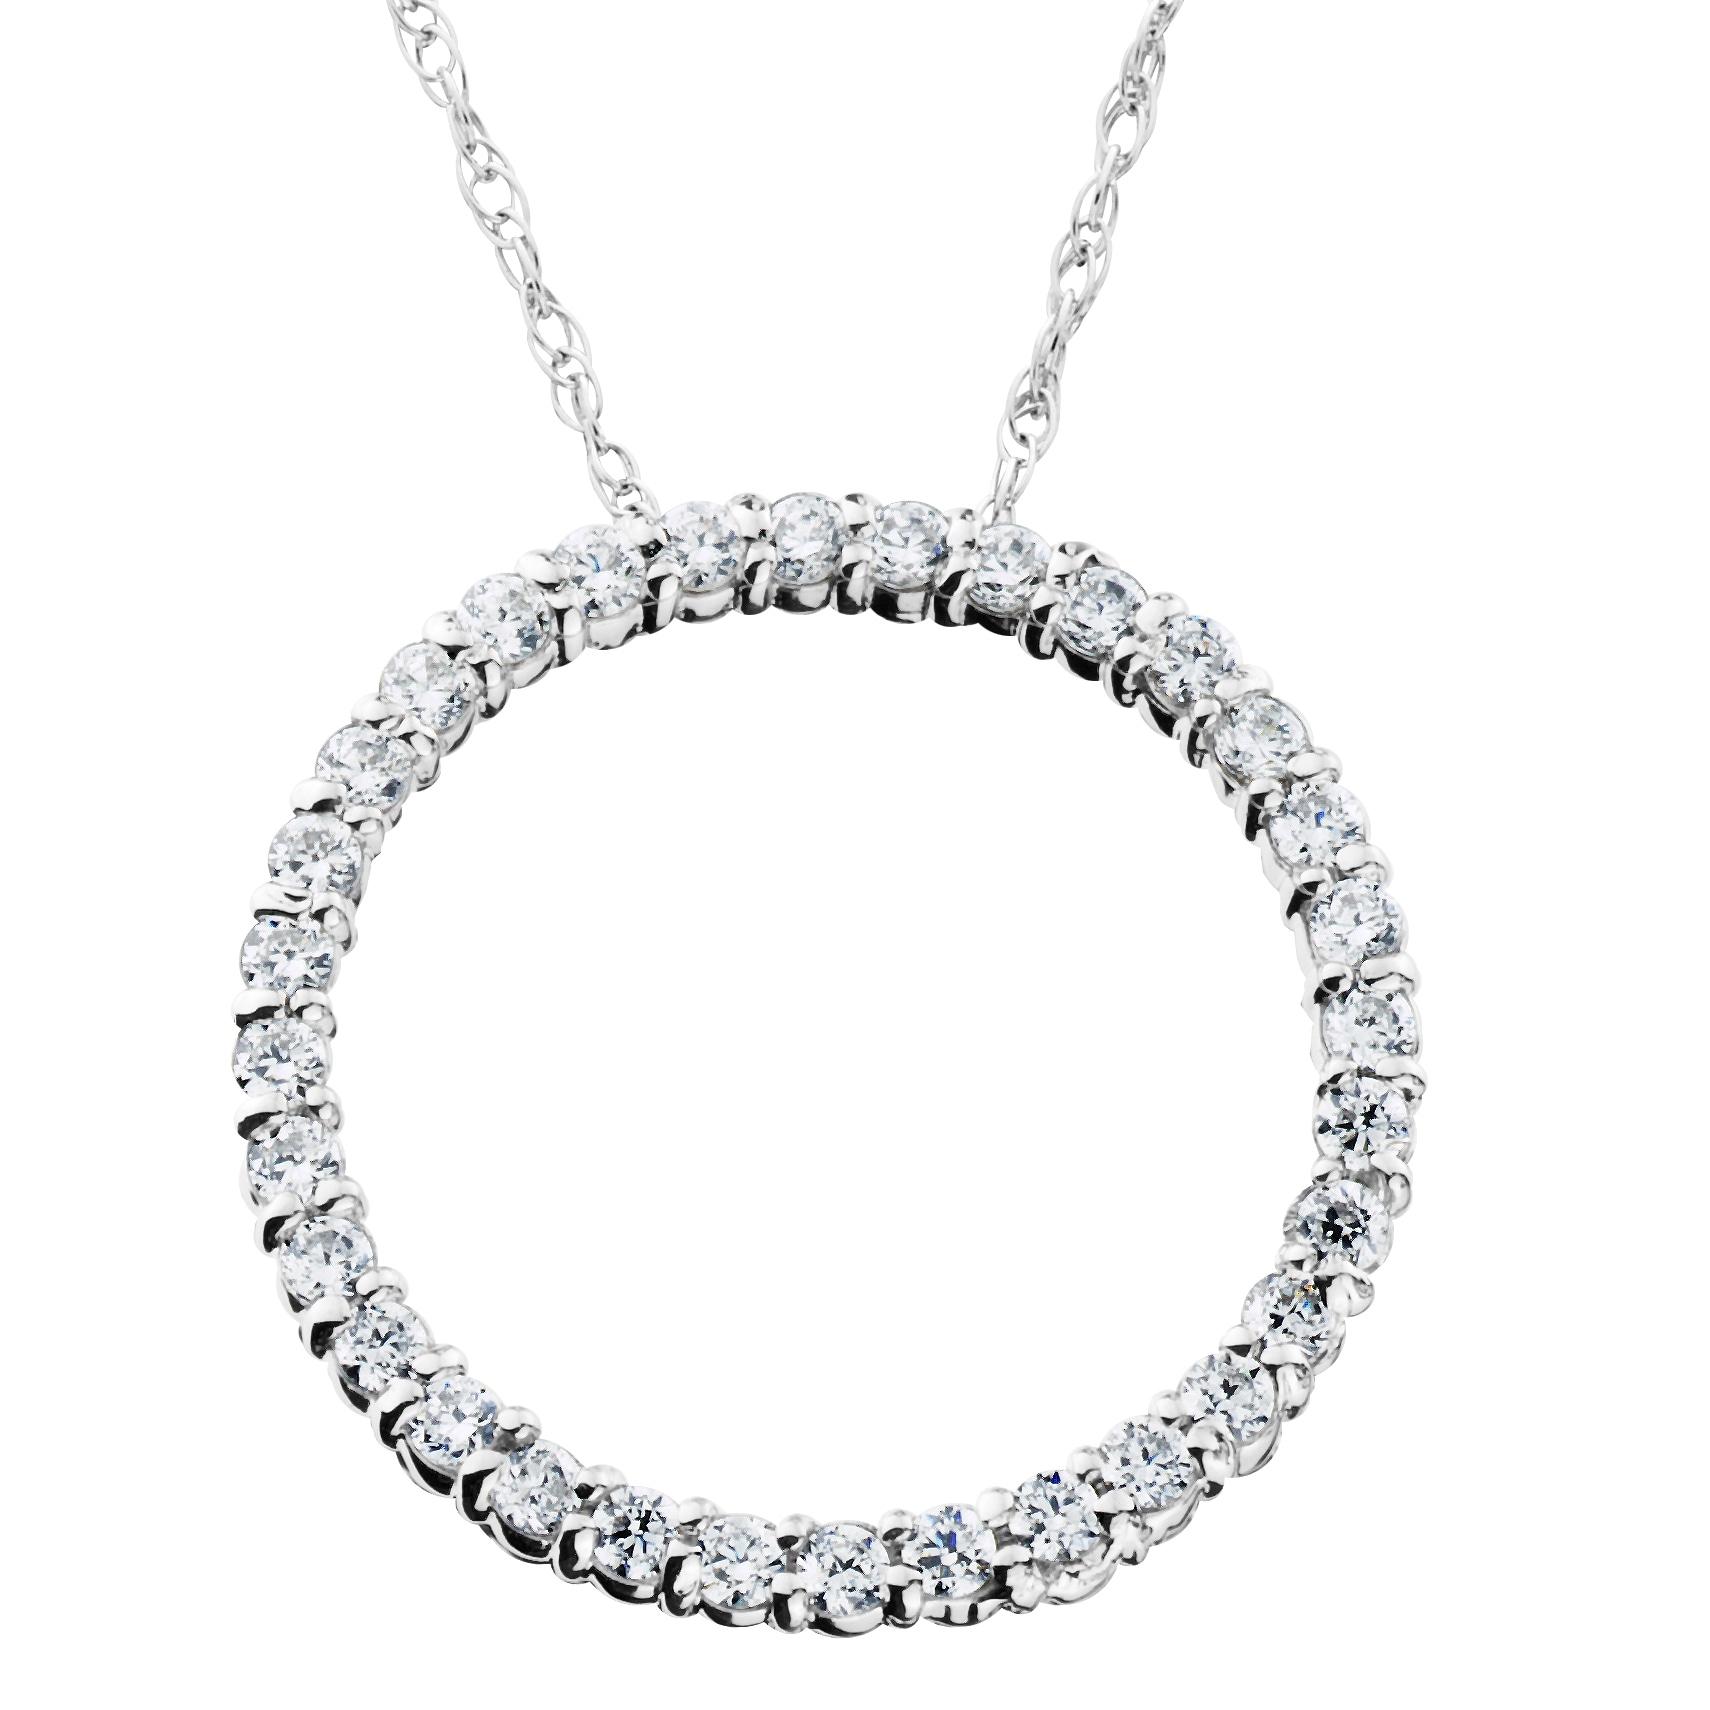 14k white gold 12ct tdw circle of life diamond pendant free 14k white gold 12ct tdw circle of life diamond pendant free shipping today overstock 17682724 aloadofball Gallery